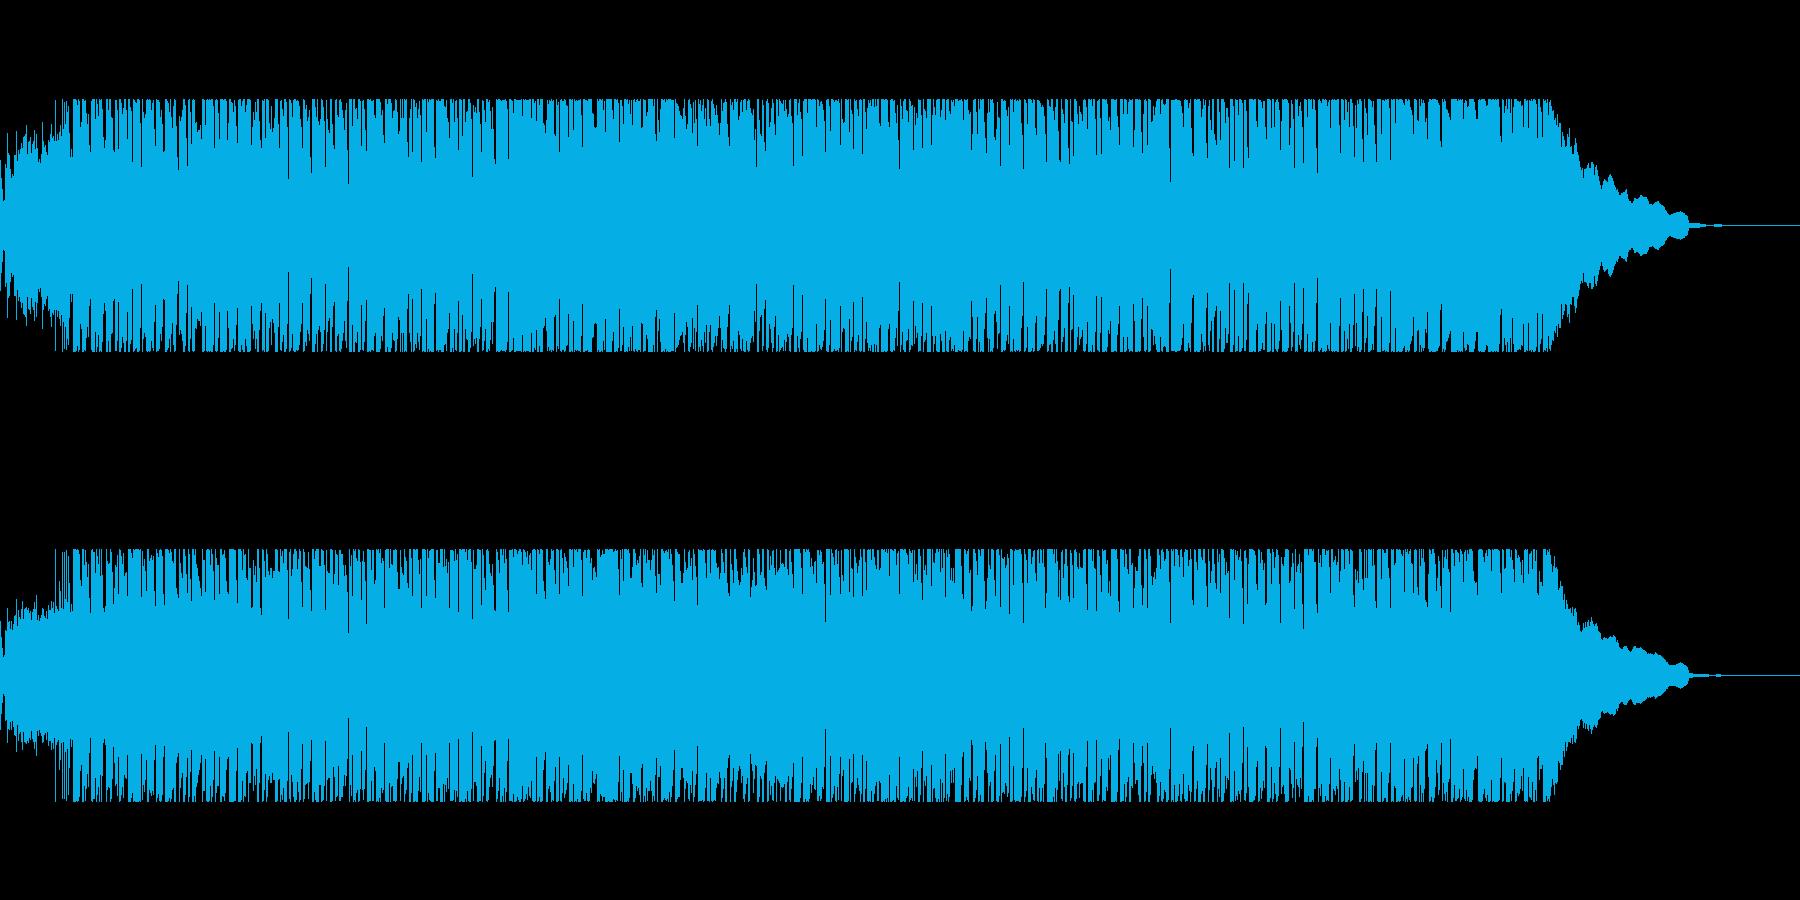 【CM】春の躍動感溢れるポップロックの再生済みの波形